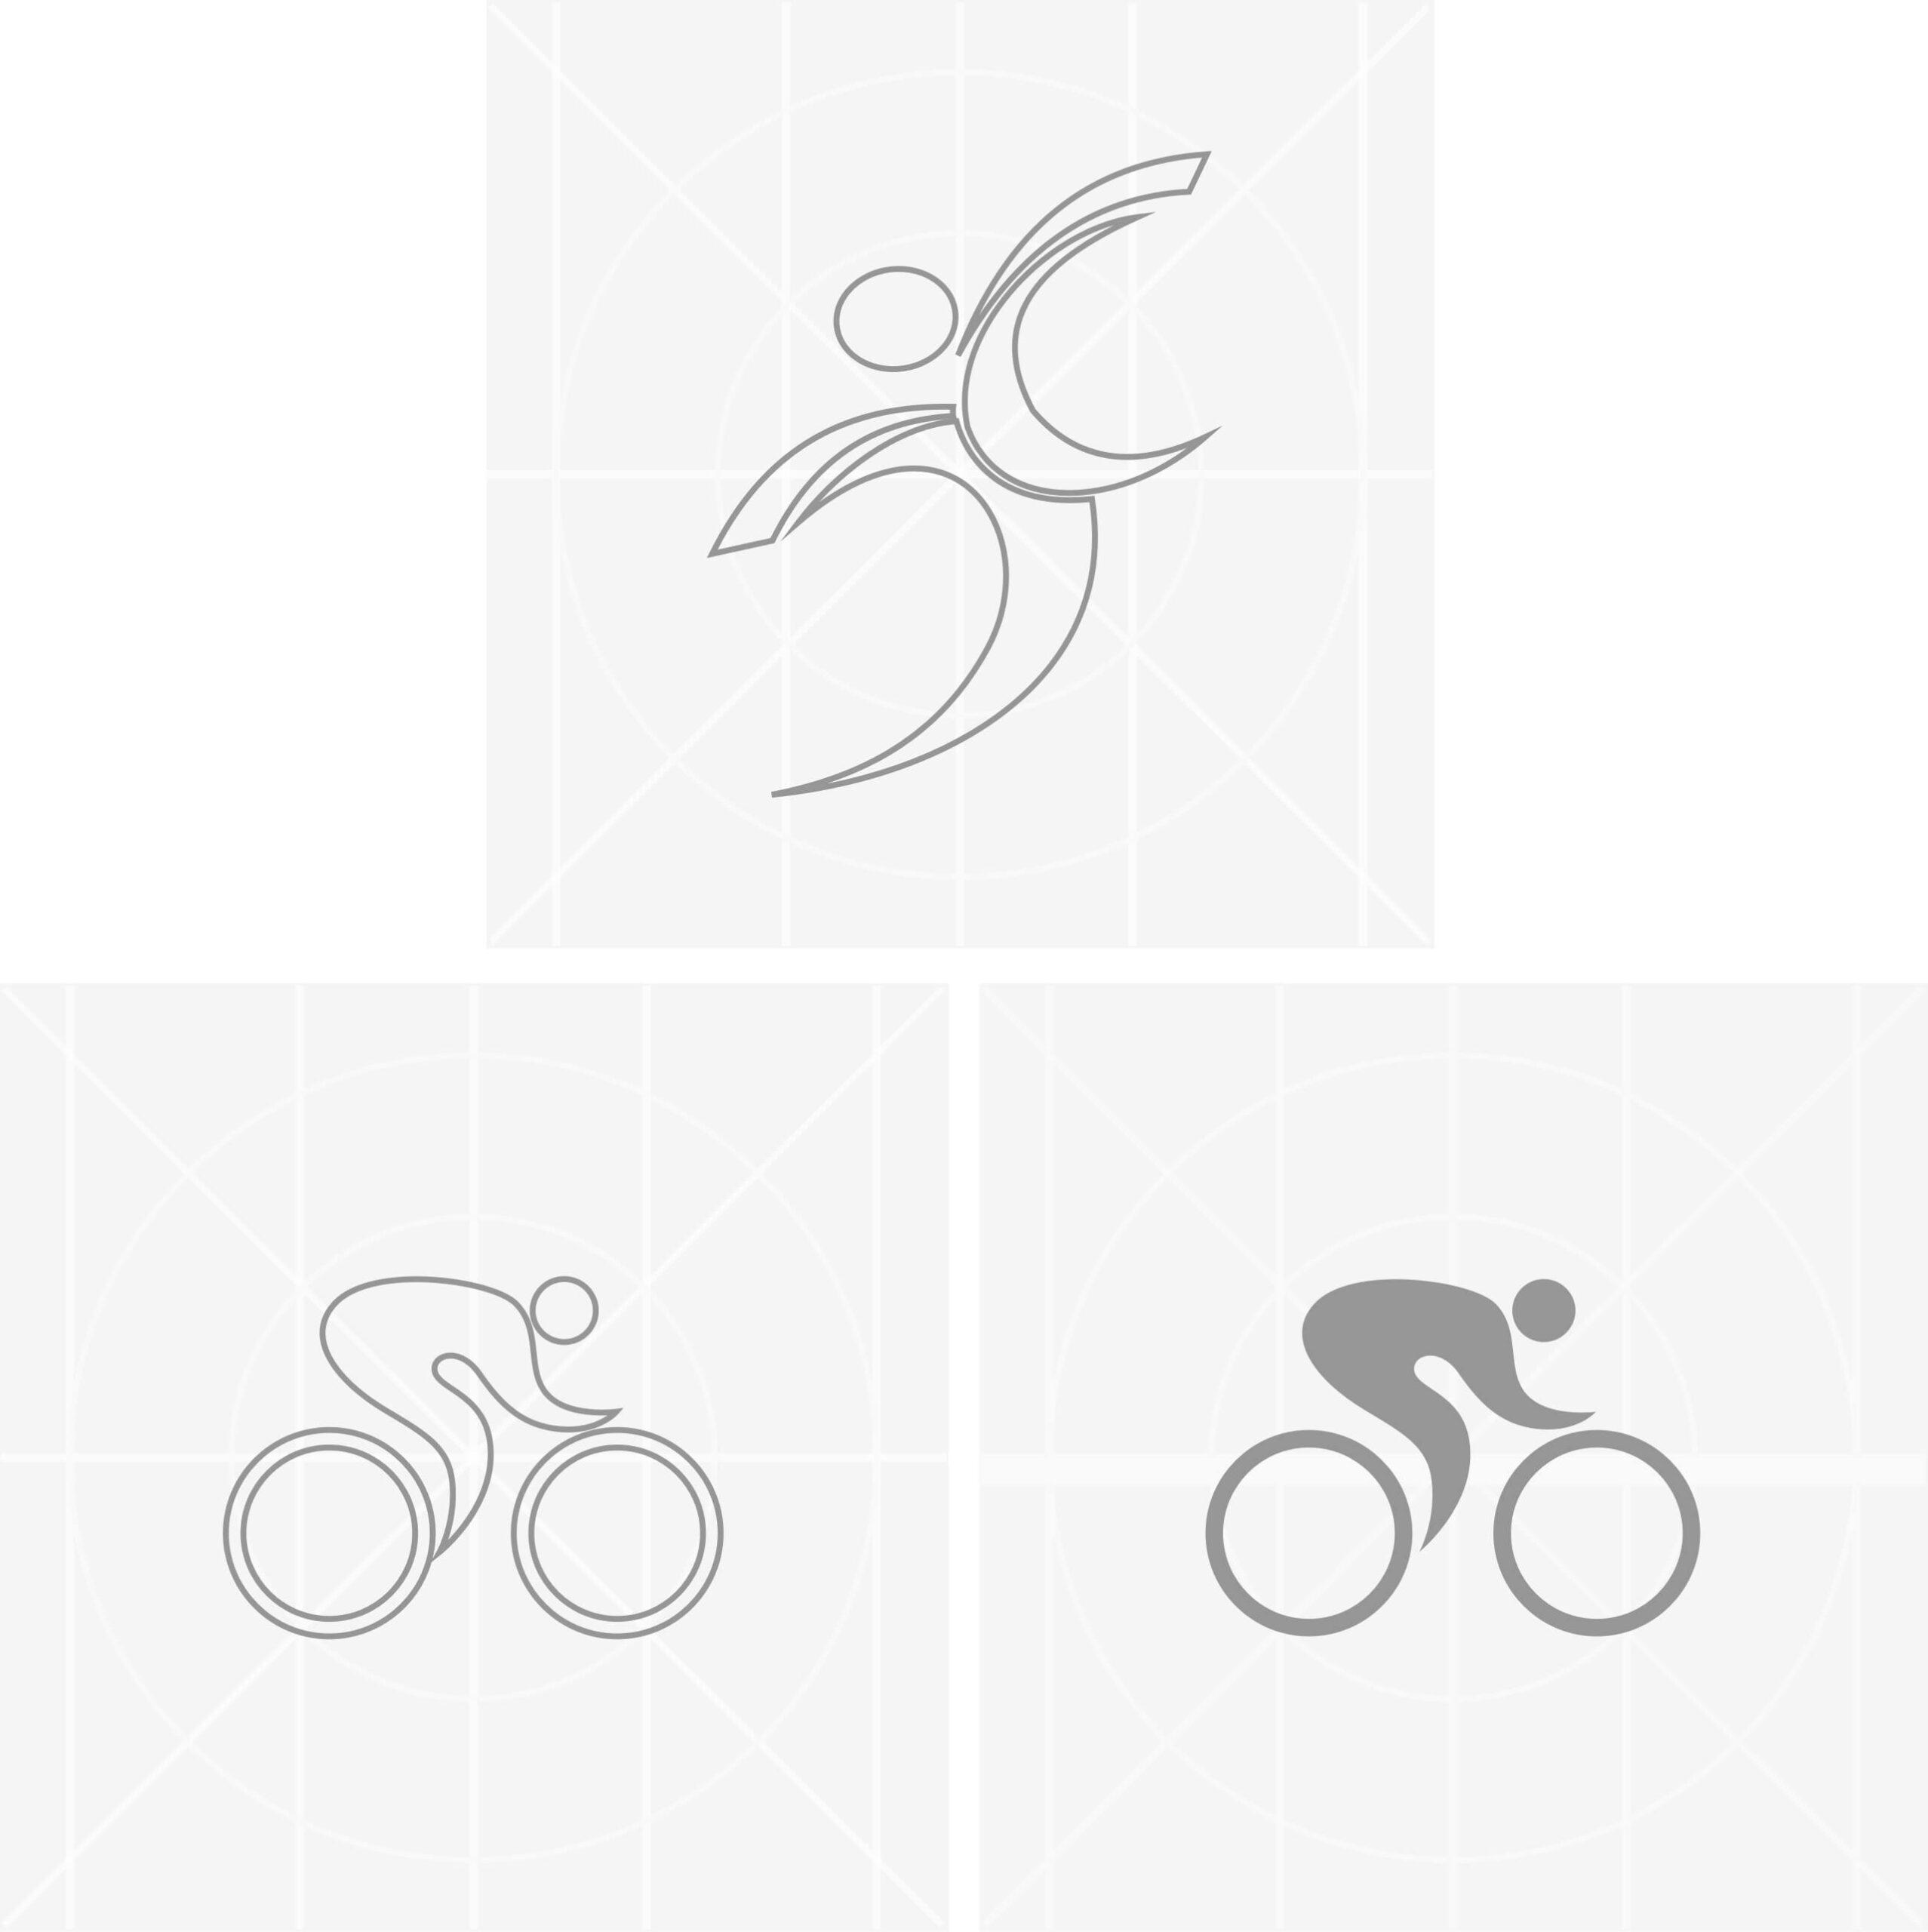 asc-icon_font